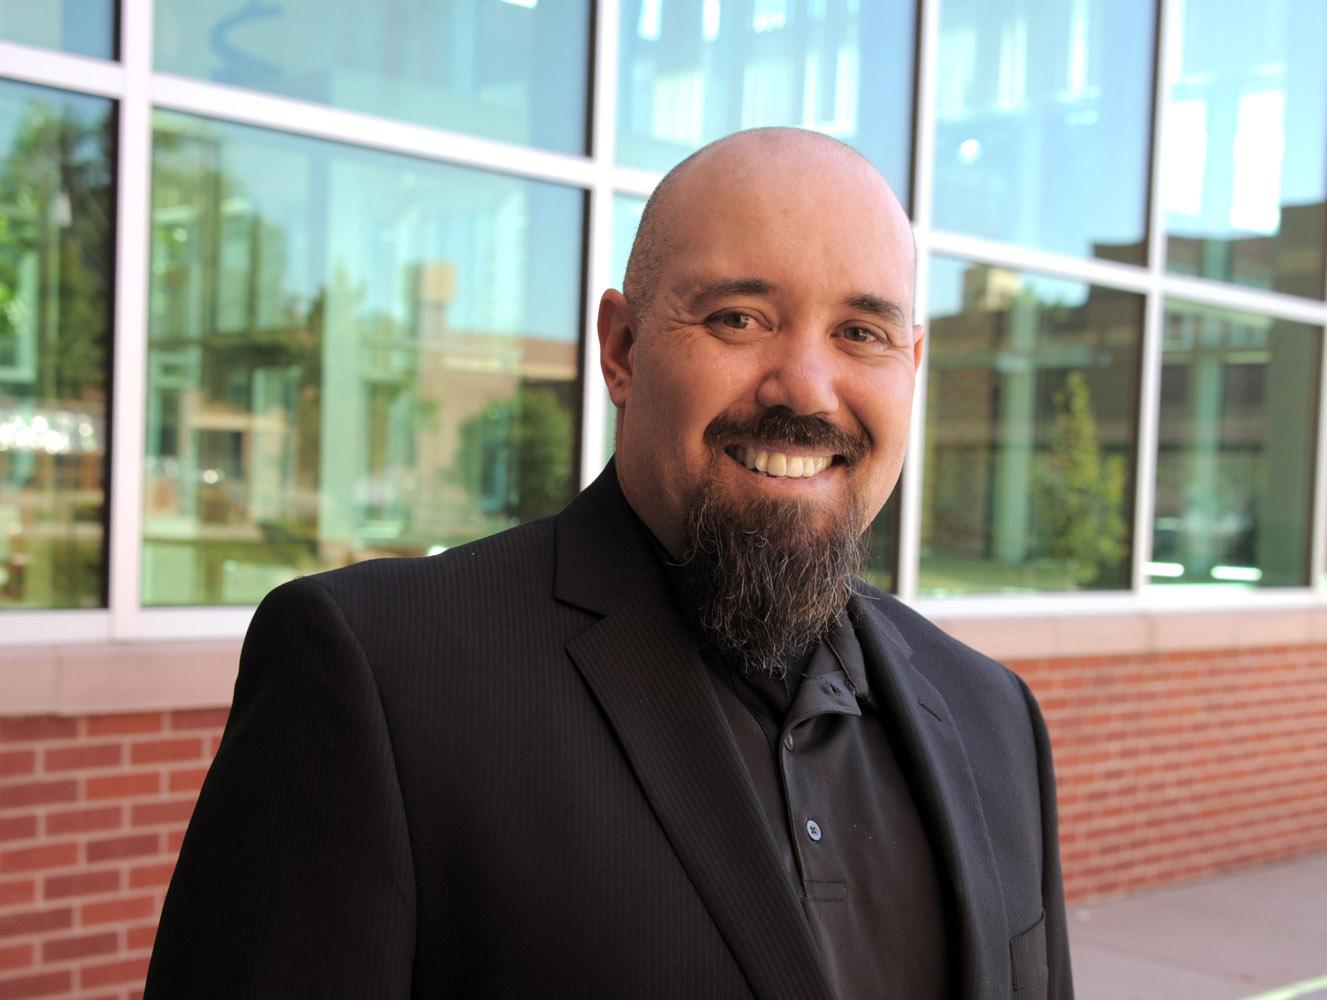 <p>Sean Wybrant, a career and technical education teacher at William J. Palmer High School inColorado Springs, is the 2017 Colorado Teacher of the Year.</p>